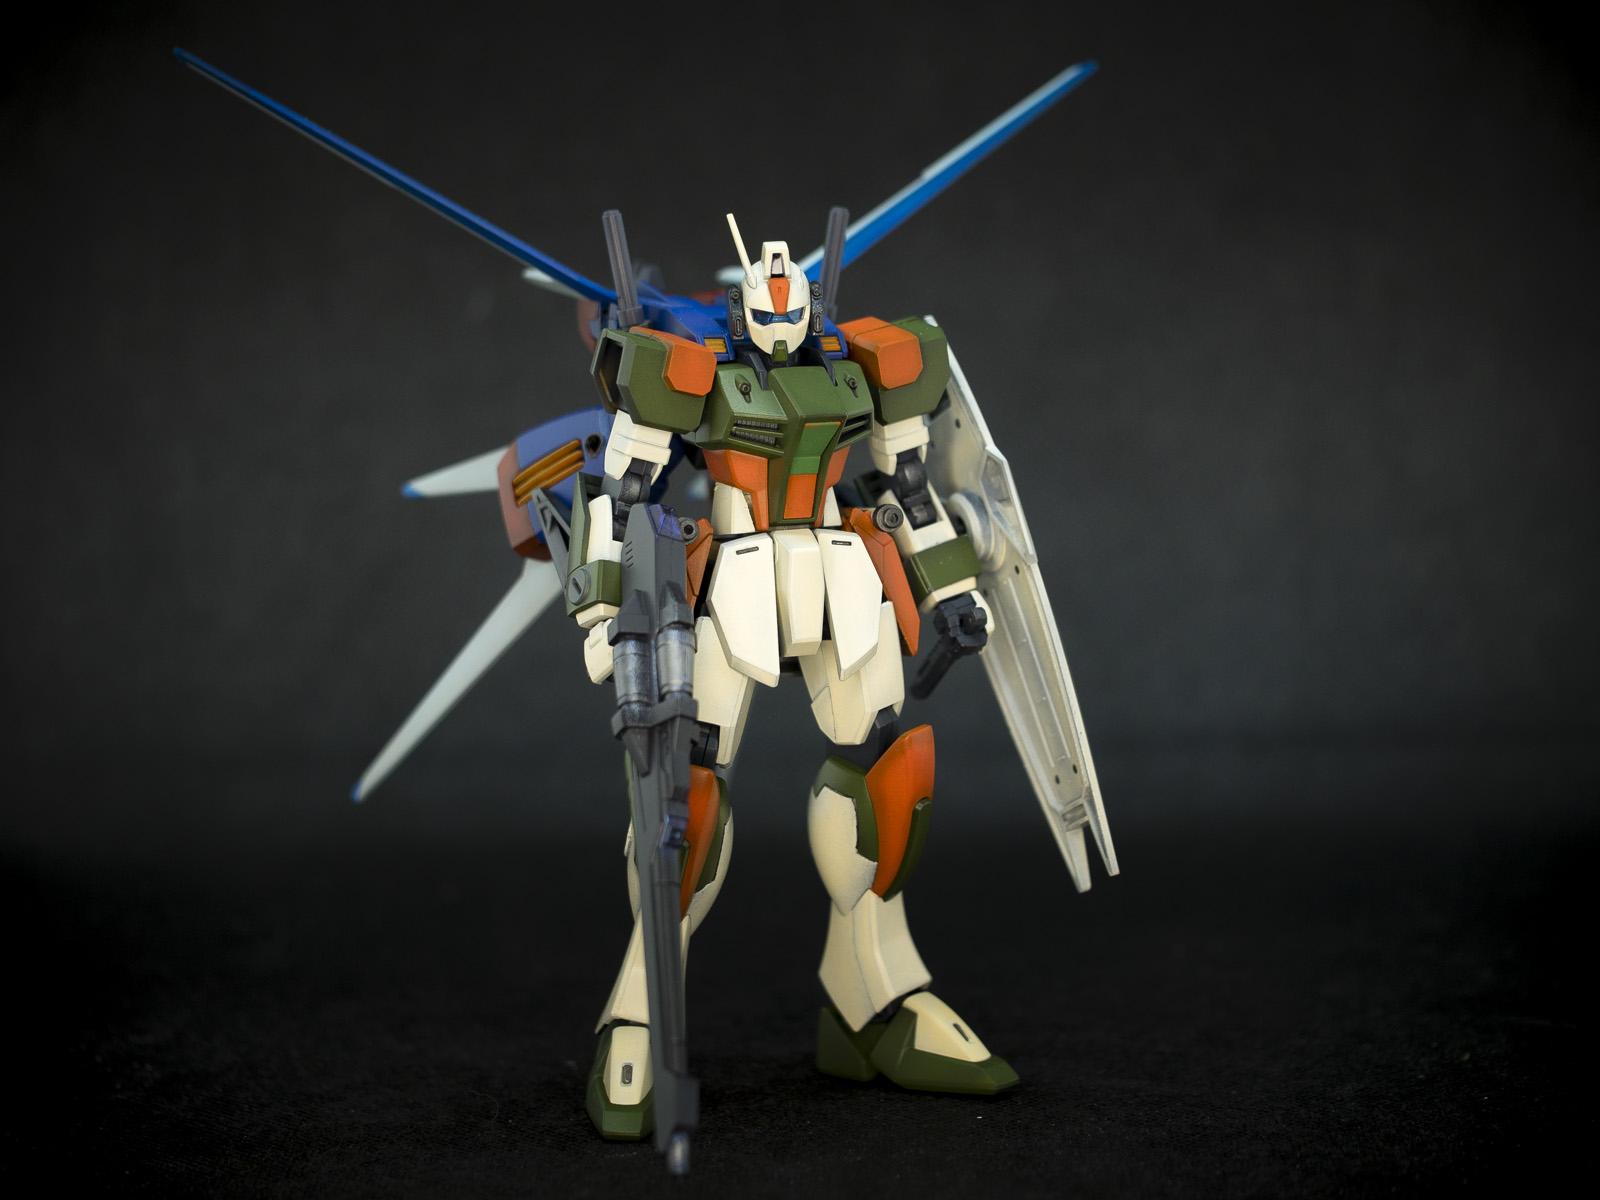 Bandai 1/144 HGCE GAT-02L2 Dagger L